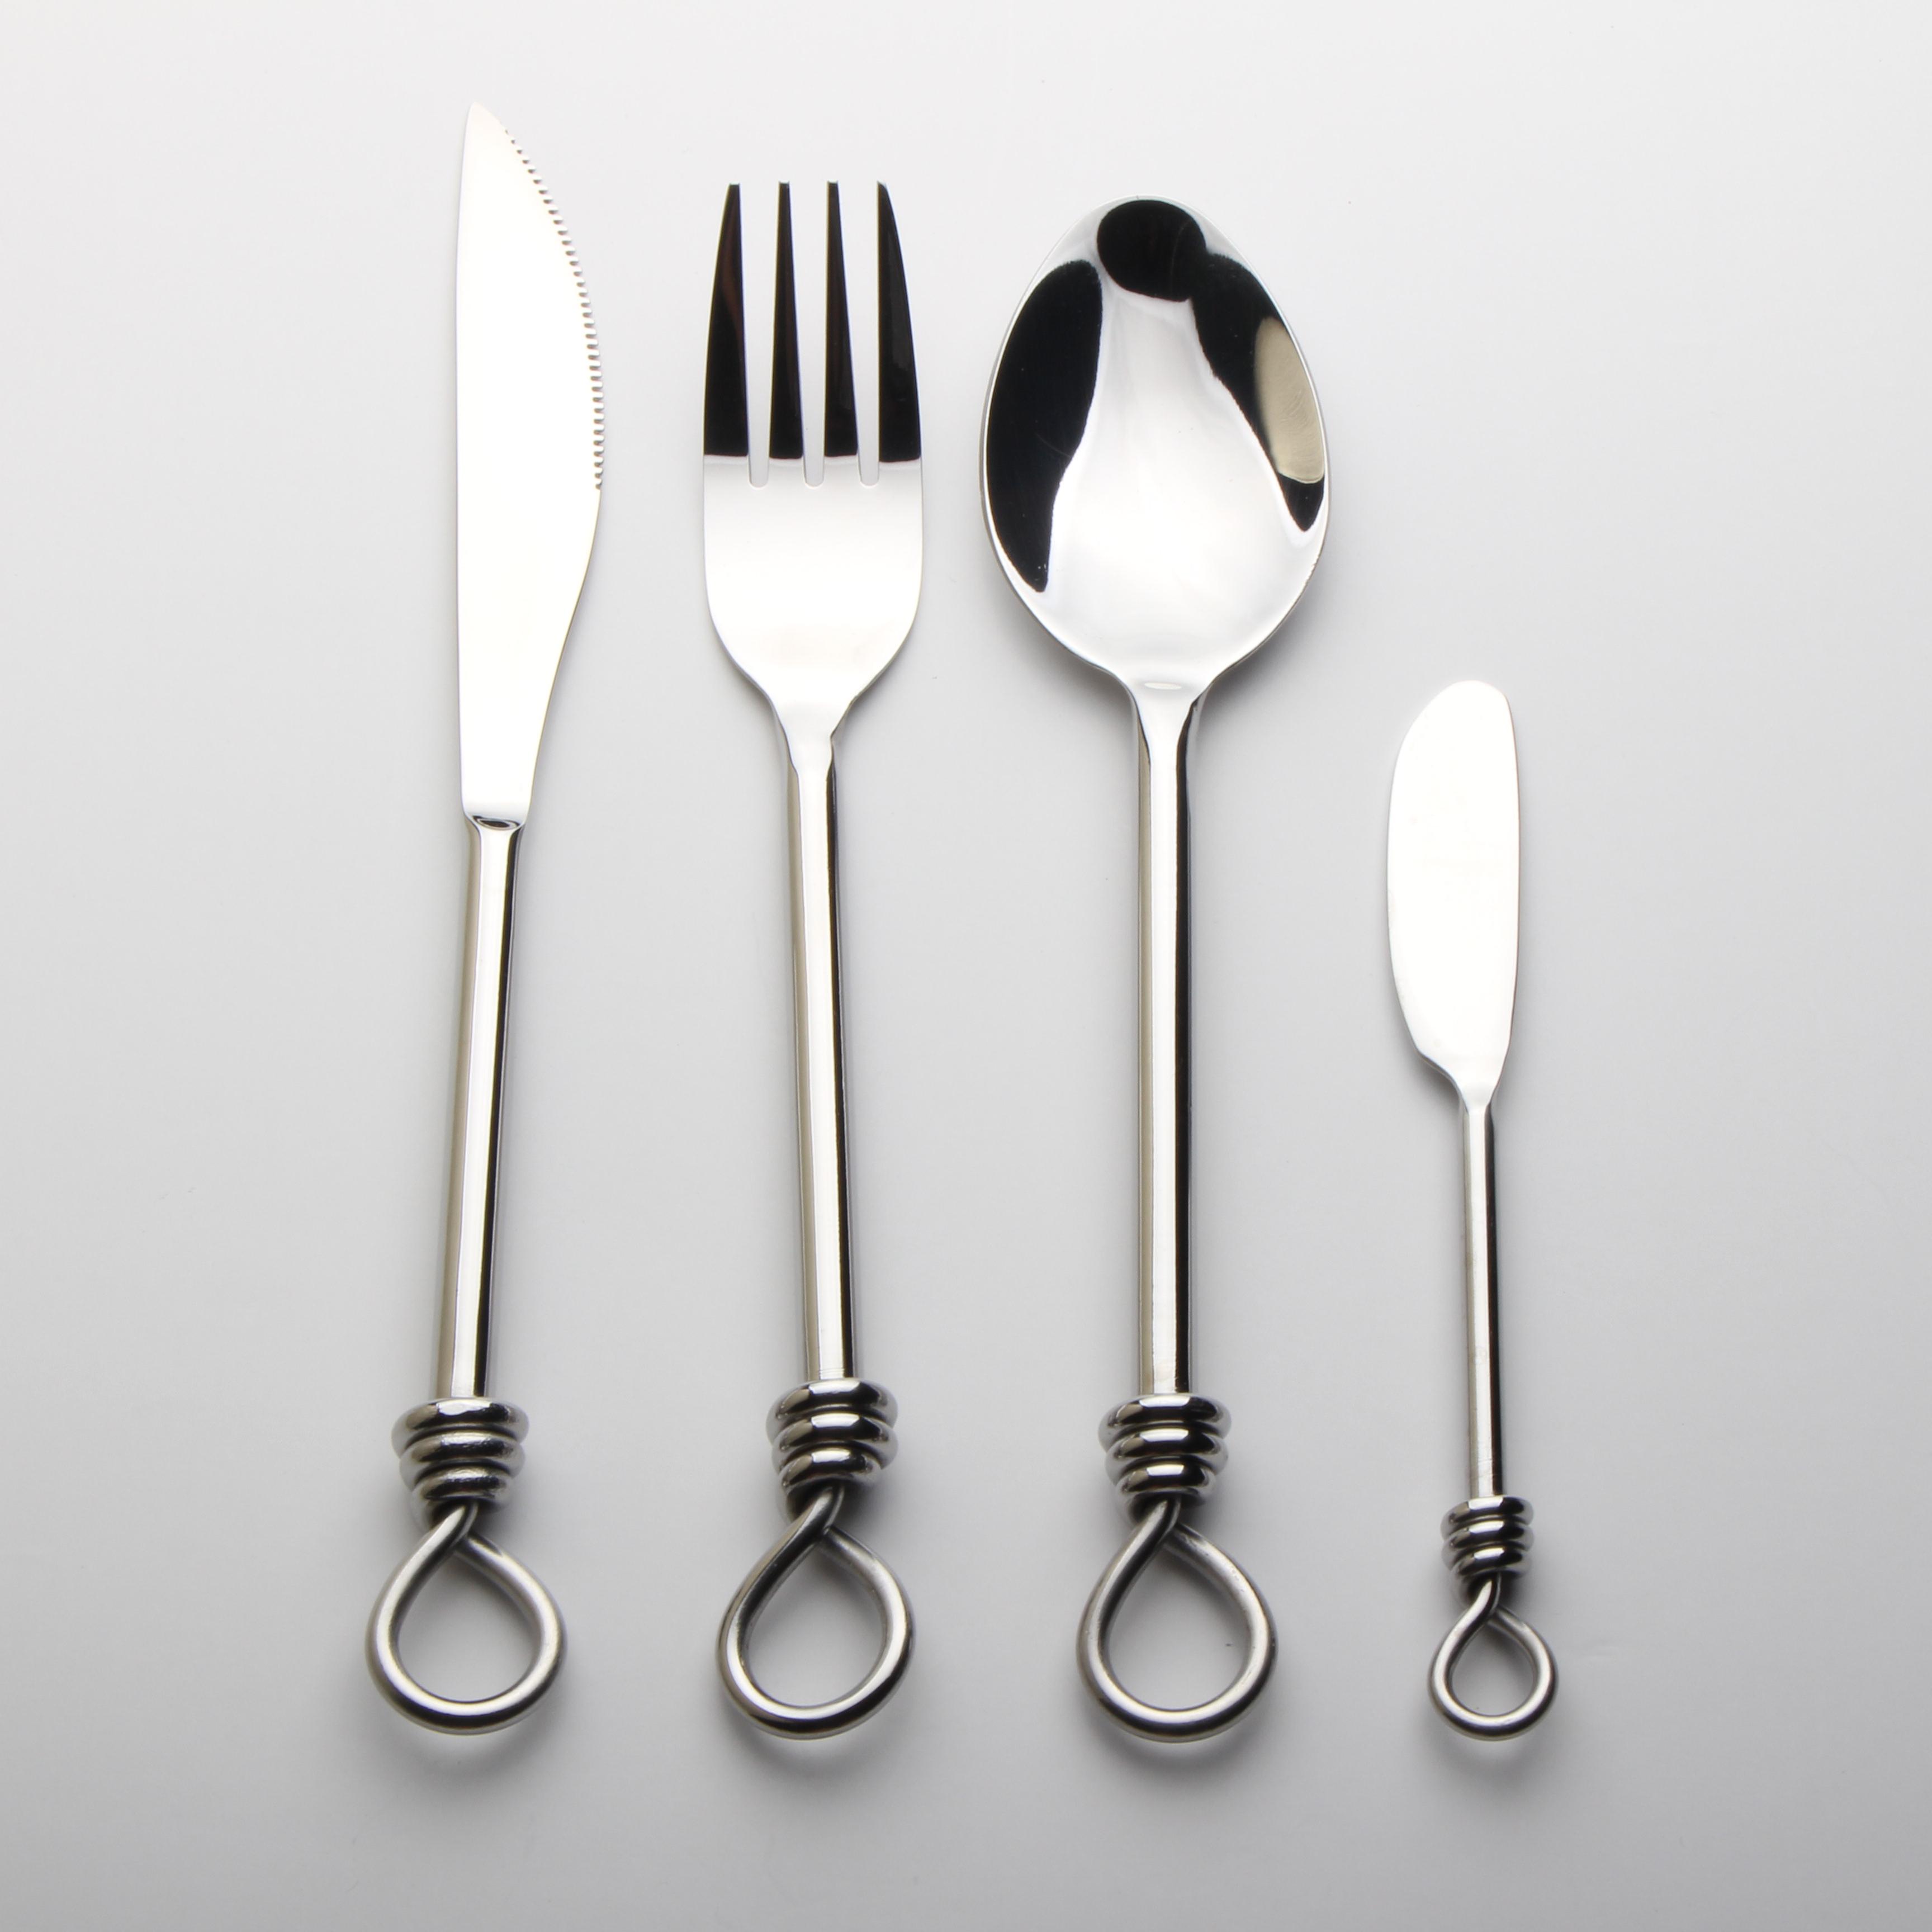 Bc3247 Fancy Twist Handle Cutlery Set 16pcs Set Stainless Steel Spiral Handle Flatware Sets Buy Twist Handle Cutlery Set Product On Alibaba Com